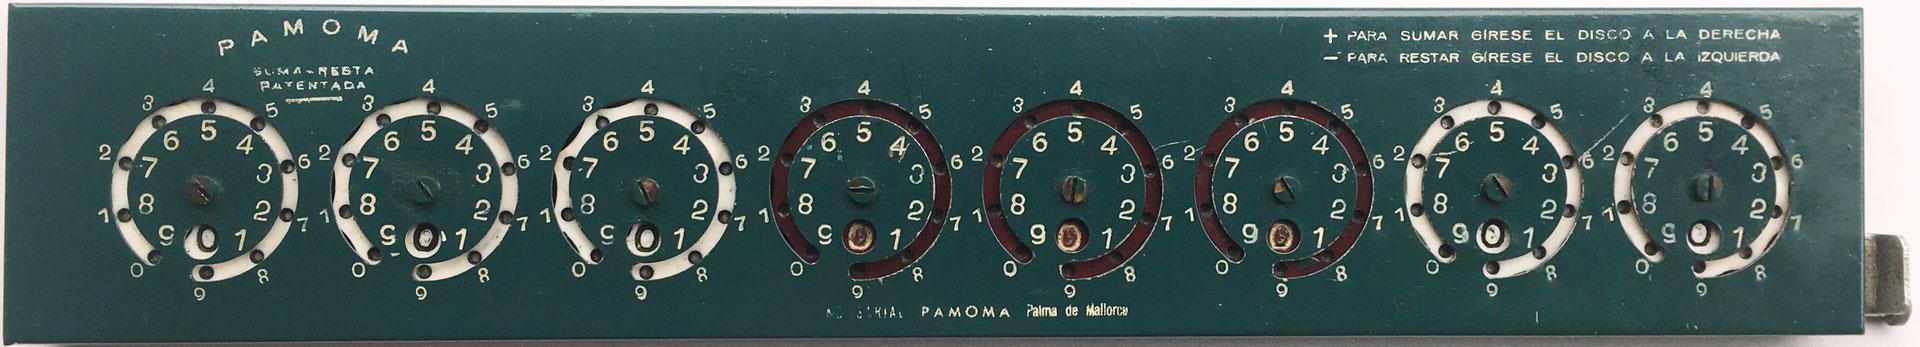 "PAMOMA (similar a Addometer Adding Machine, modelo B ""standar""), s/n 0022, Palma de Mallorca (ESPAÑA), hacia 1950, 29x6 cm"